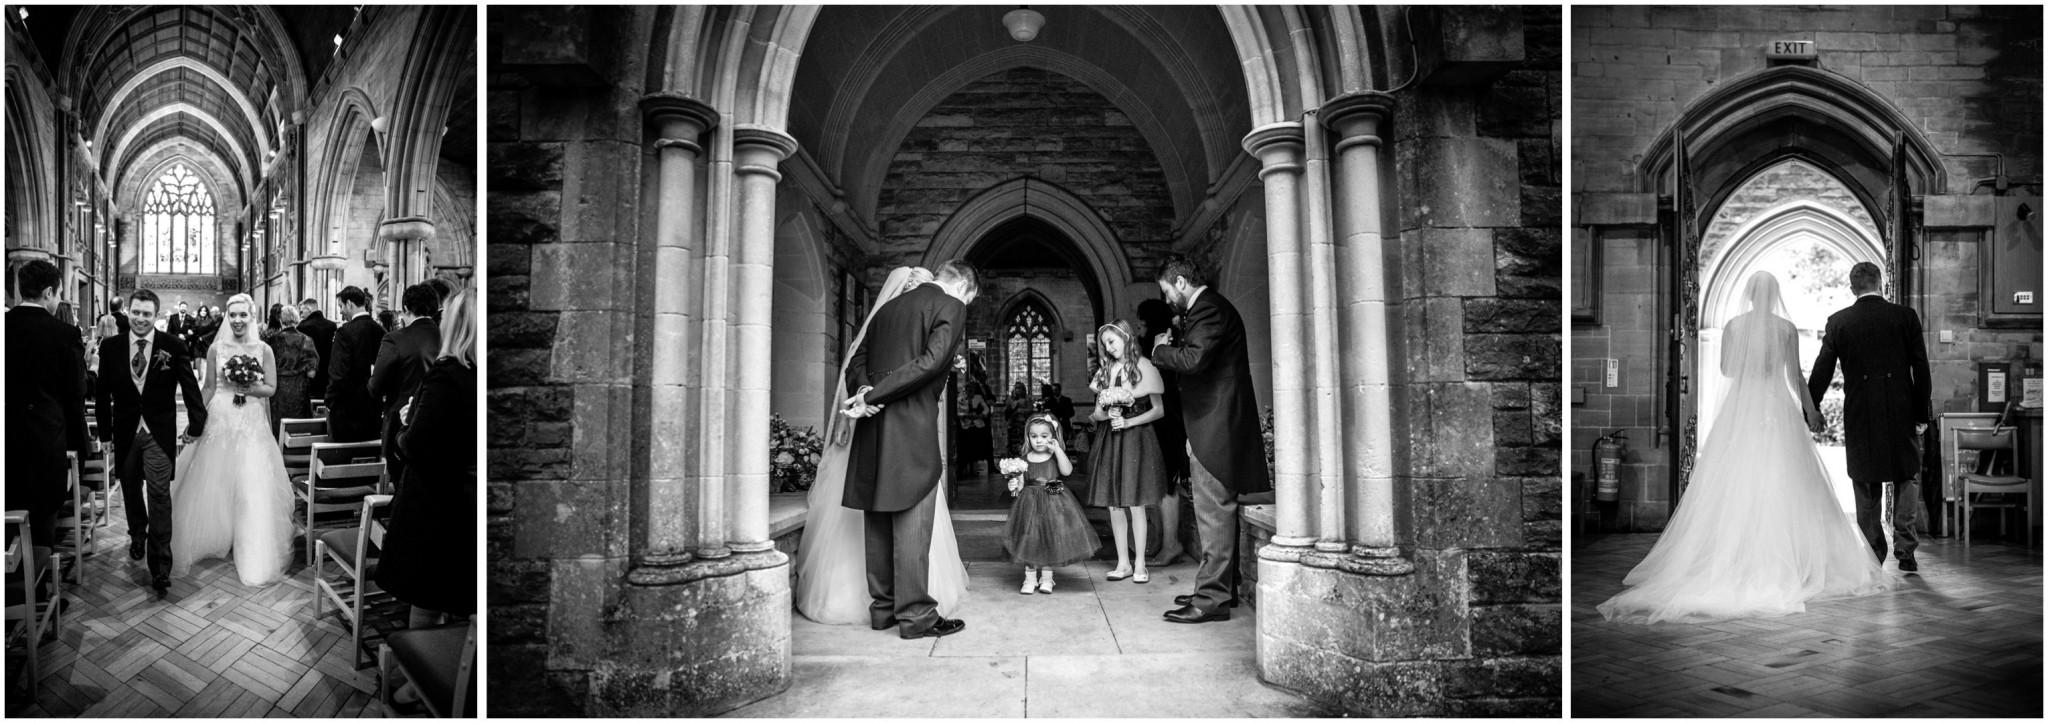 St Saviours Church Brockenhurst Bride & Groom leaving the churct